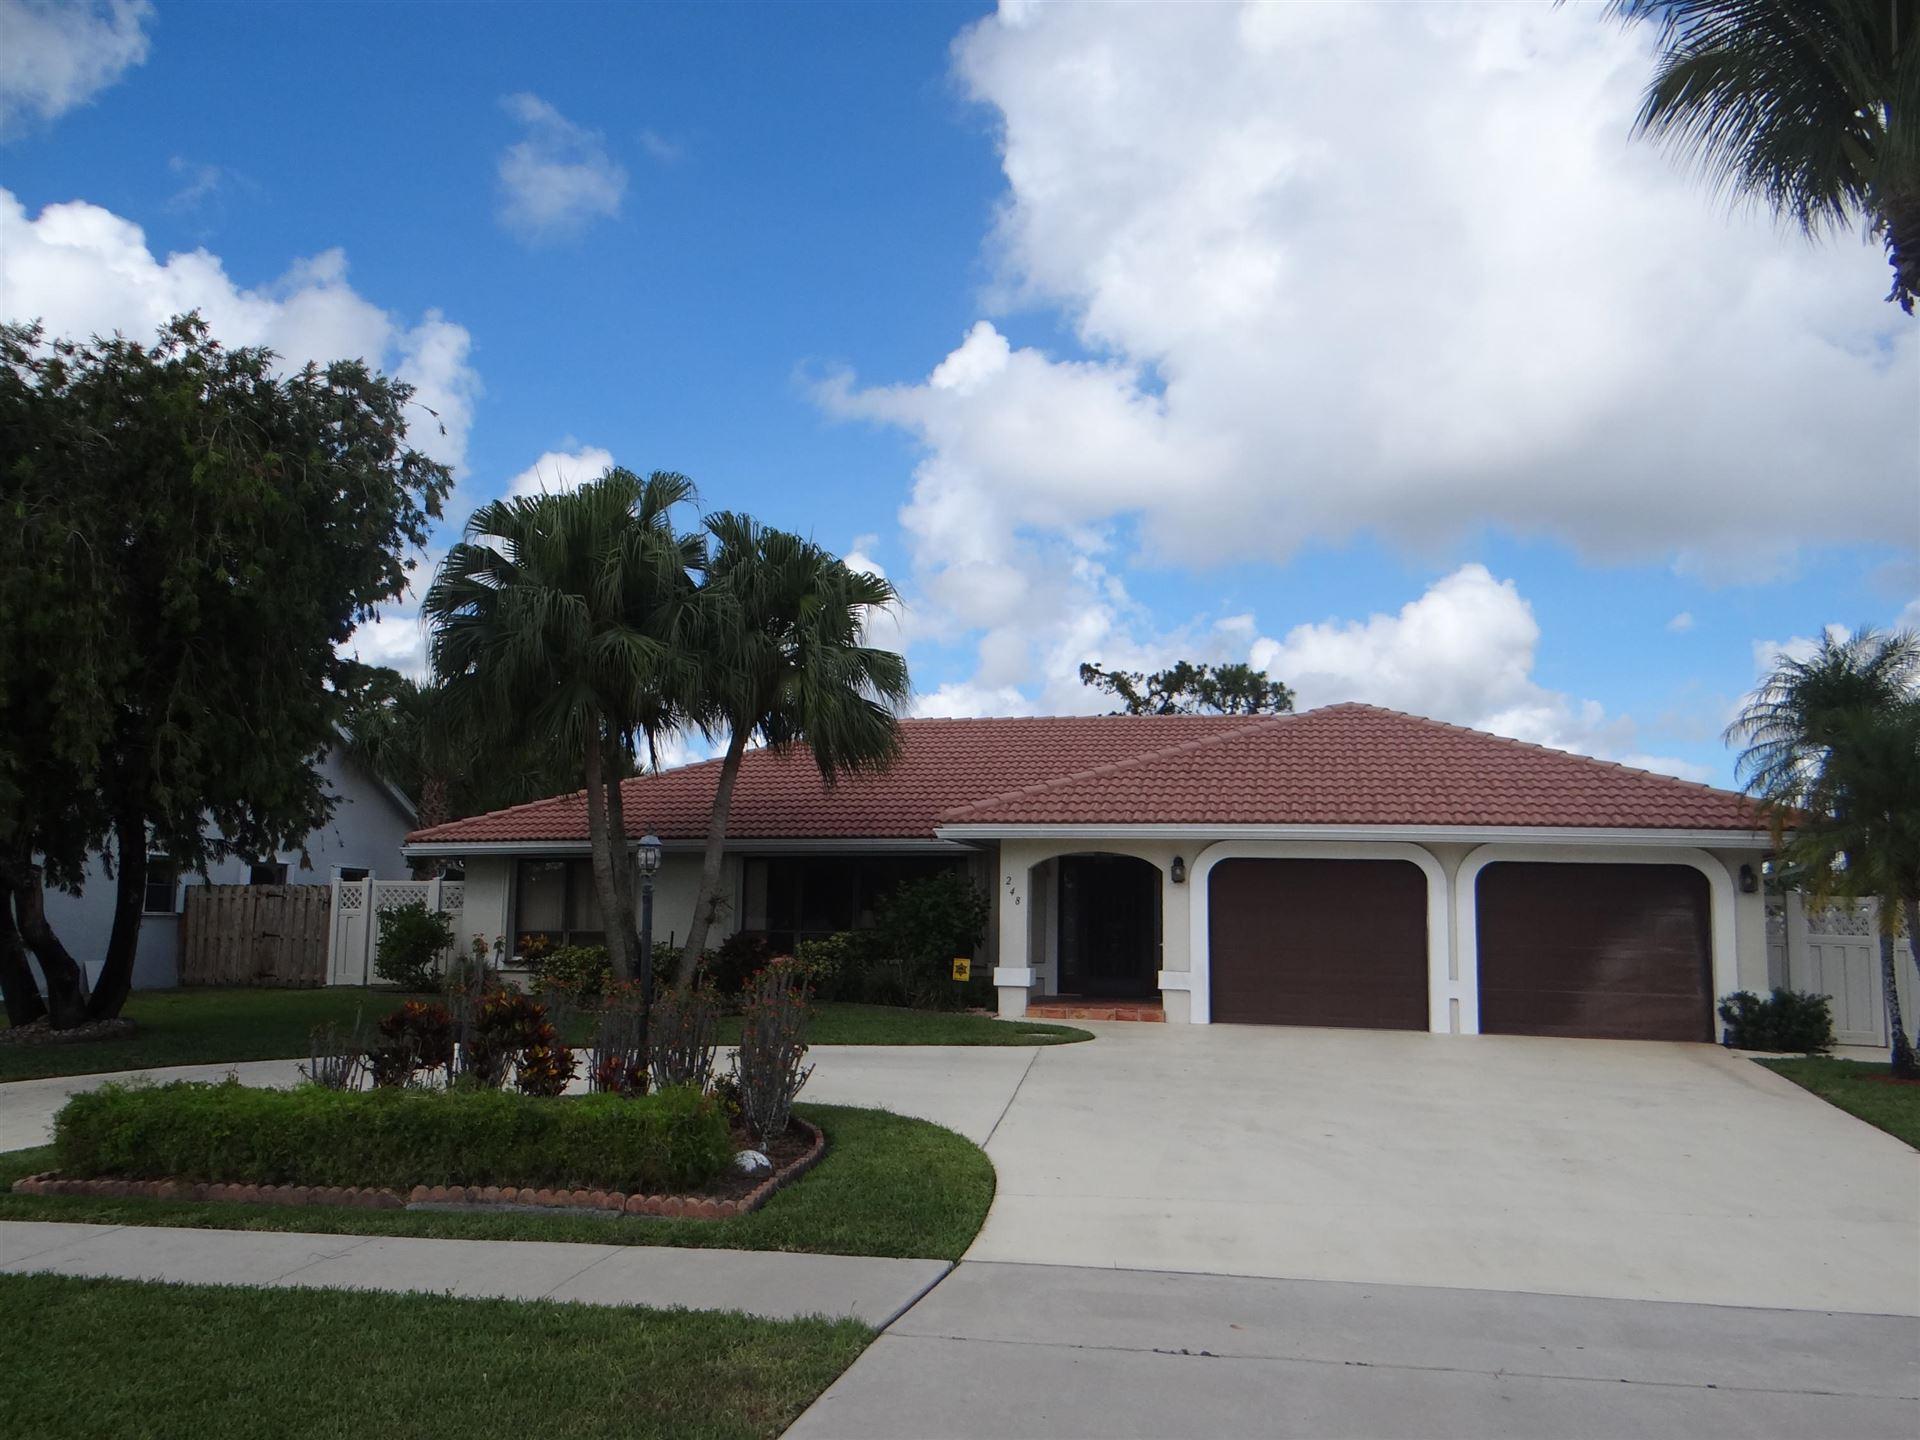 248 Ponce De Leon Street, Royal Palm Beach, FL 33411 - #: RX-10721103